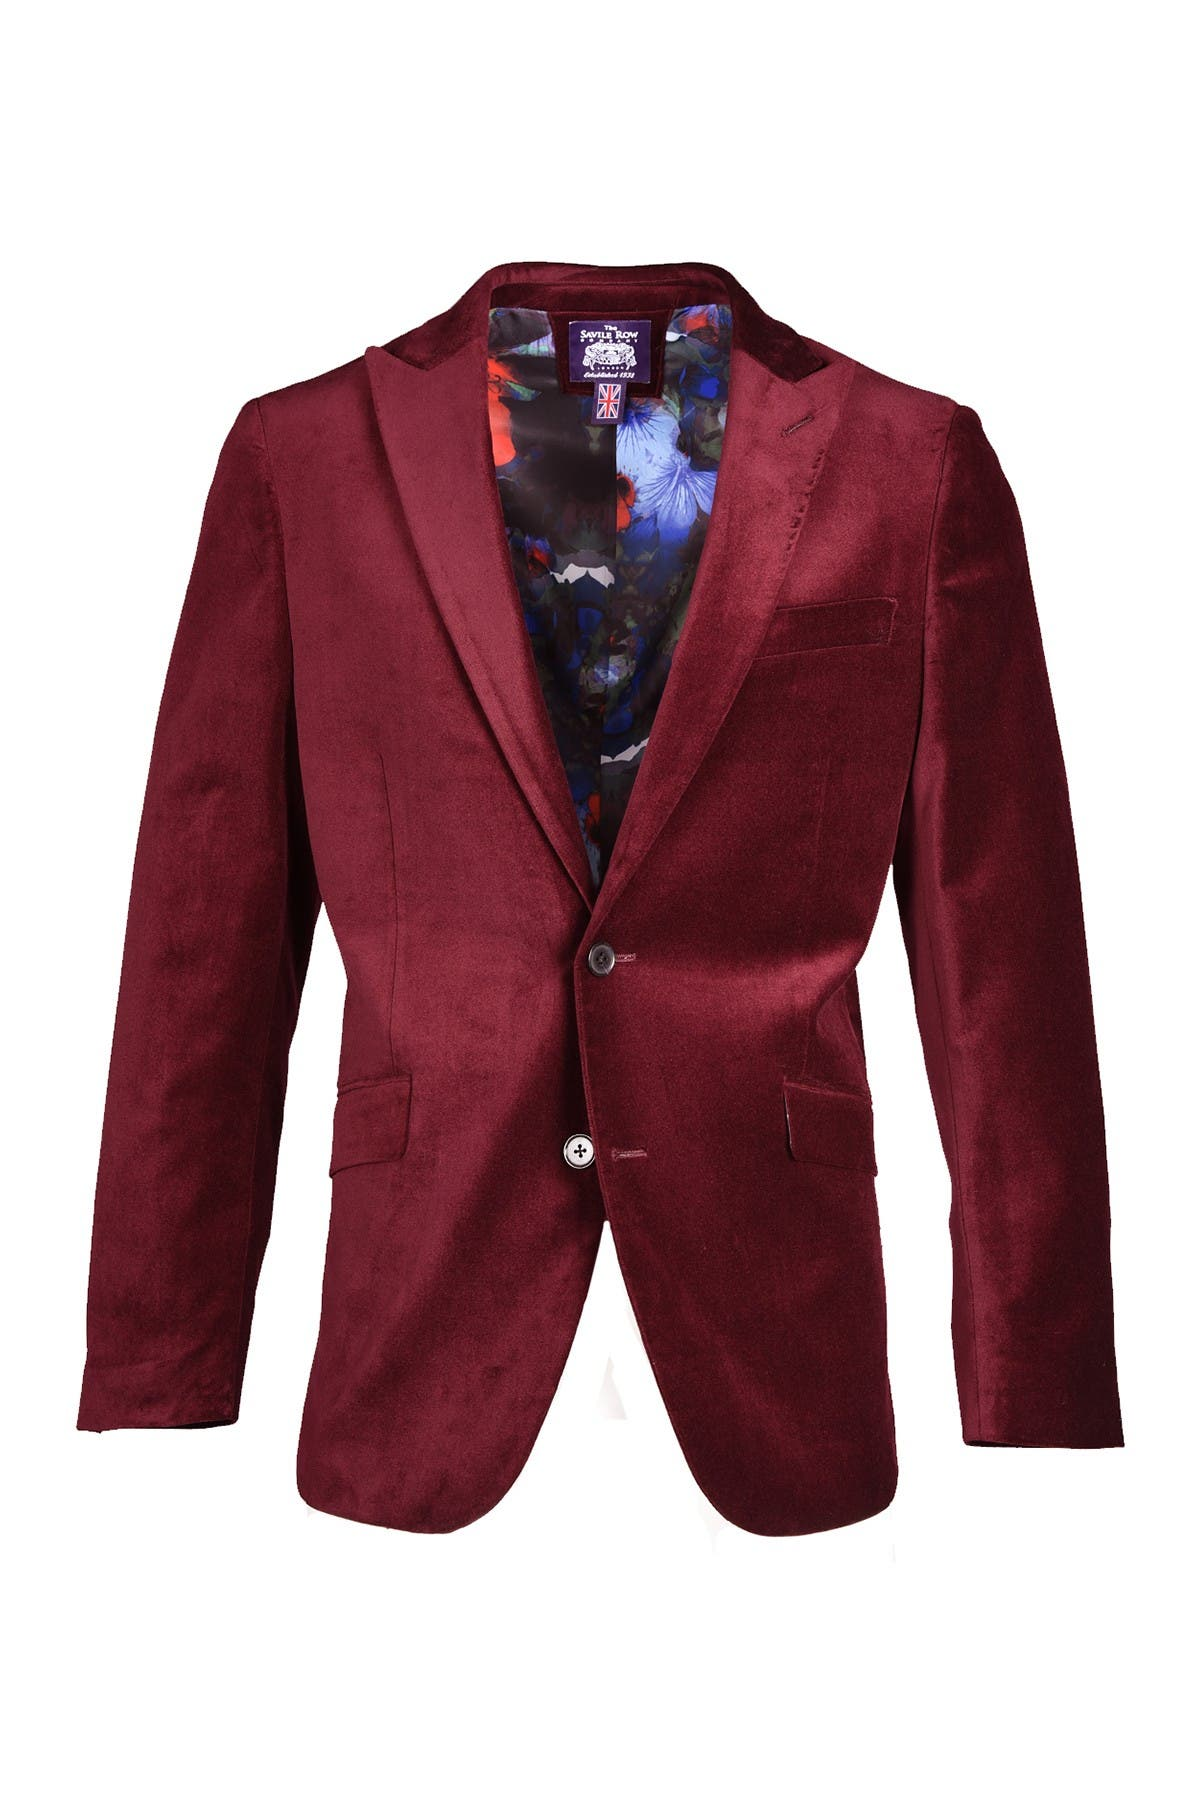 Image of SAVILE ROW CO Velvet Blazer